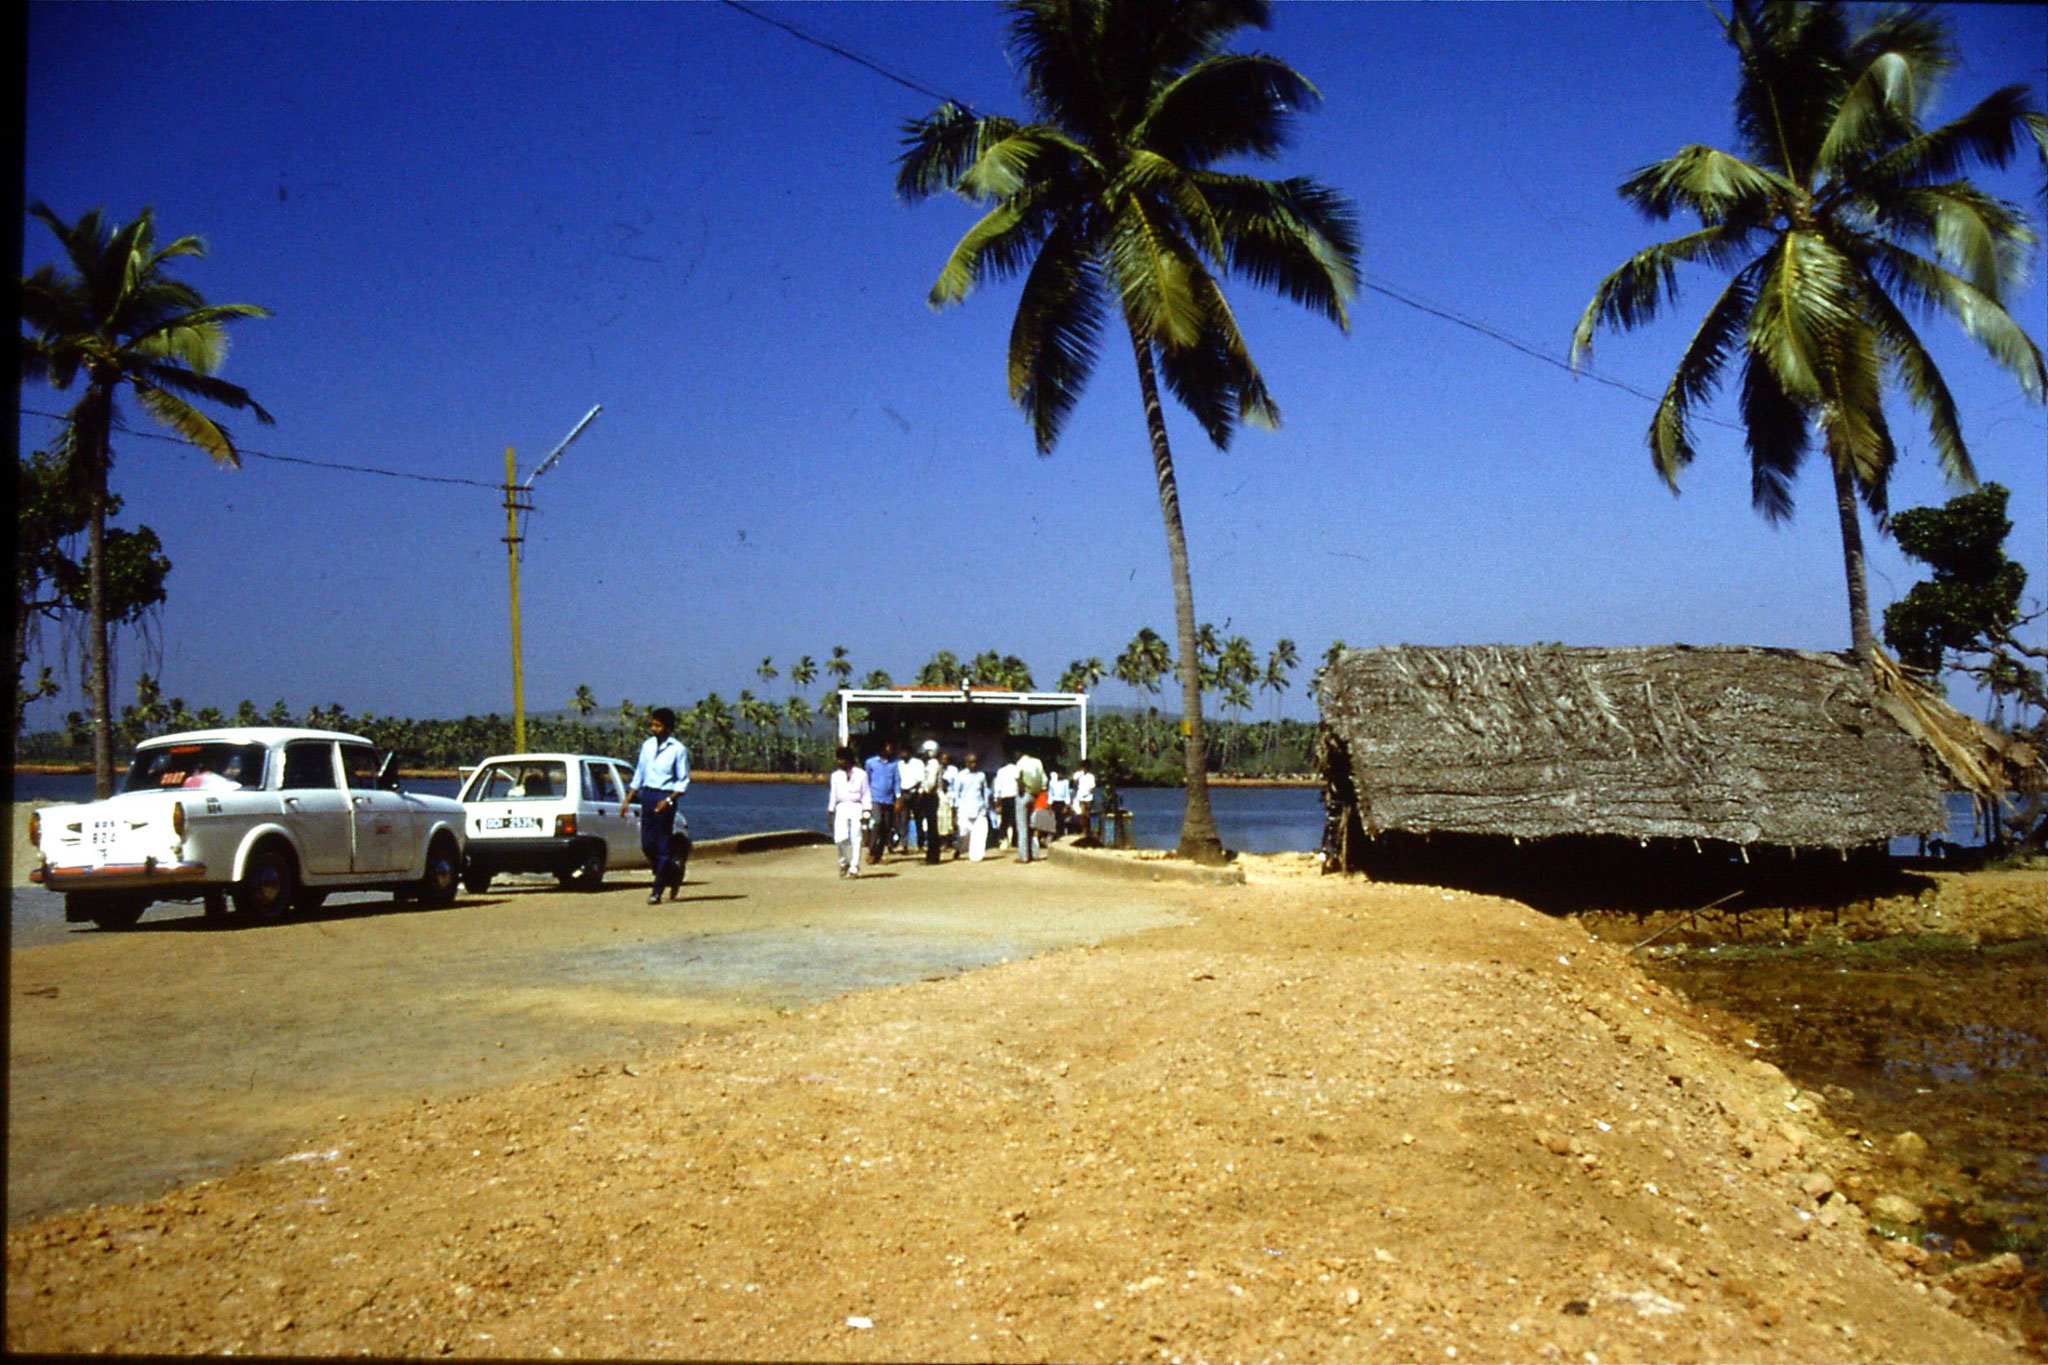 2/1/1990: 28: Terakol ferry